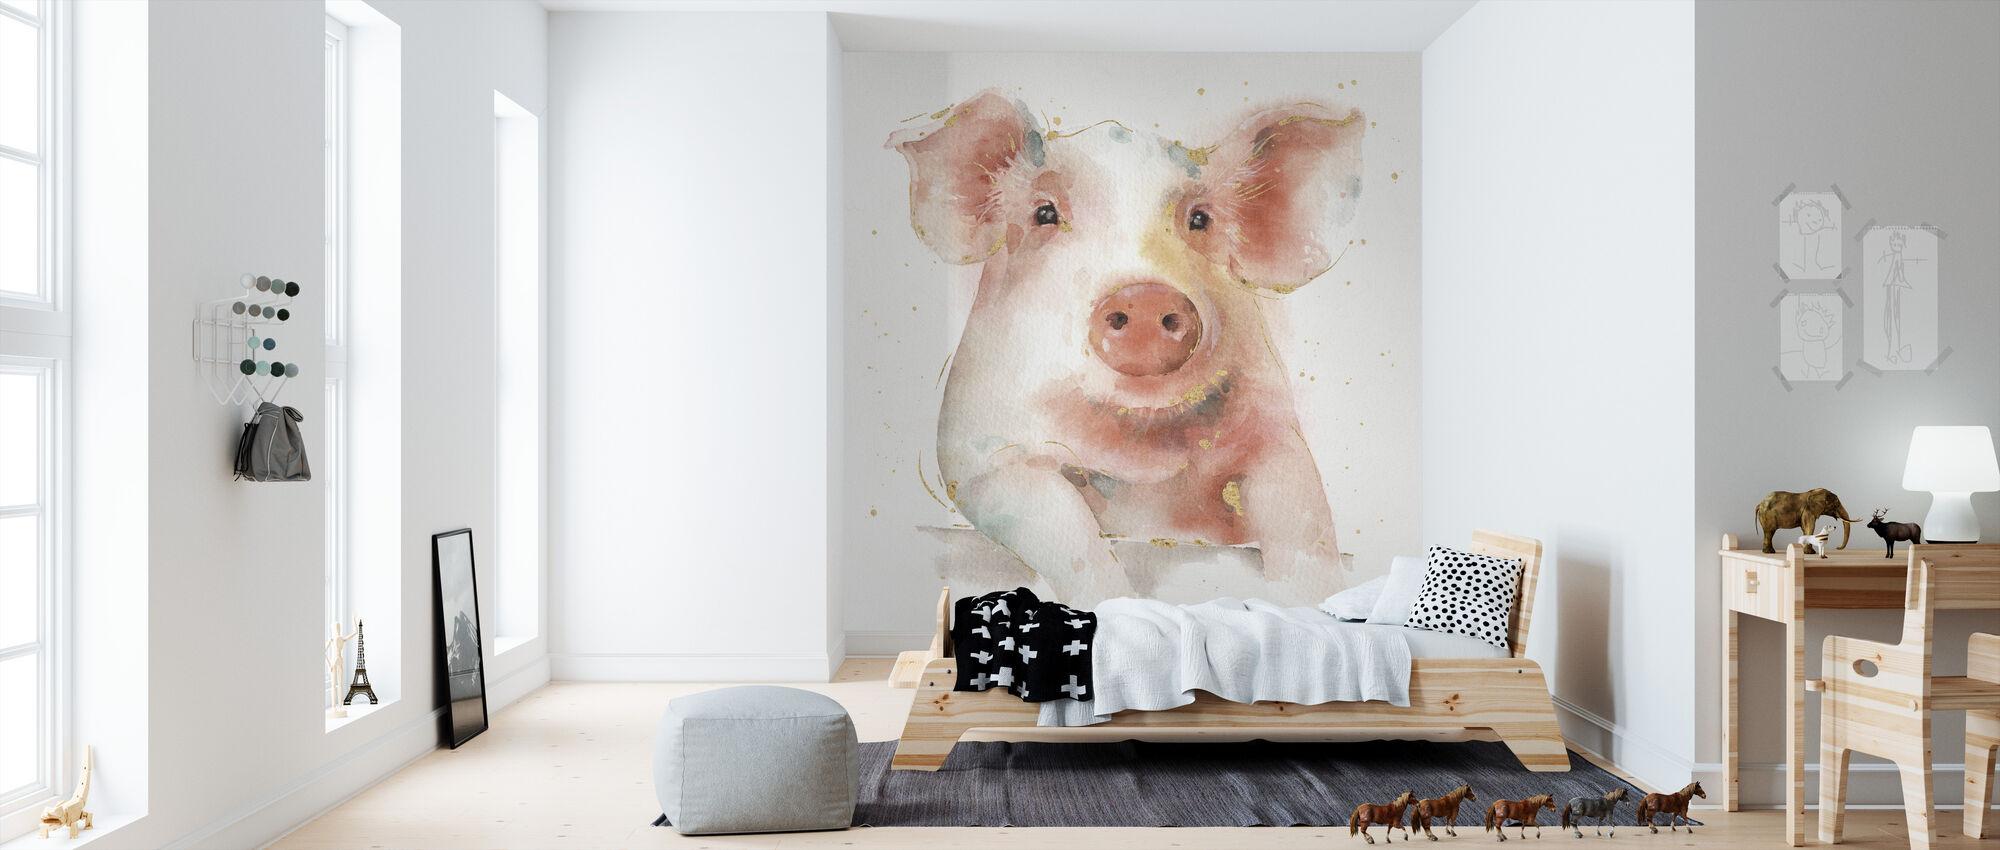 Farm Friends II - Wallpaper - Kids Room